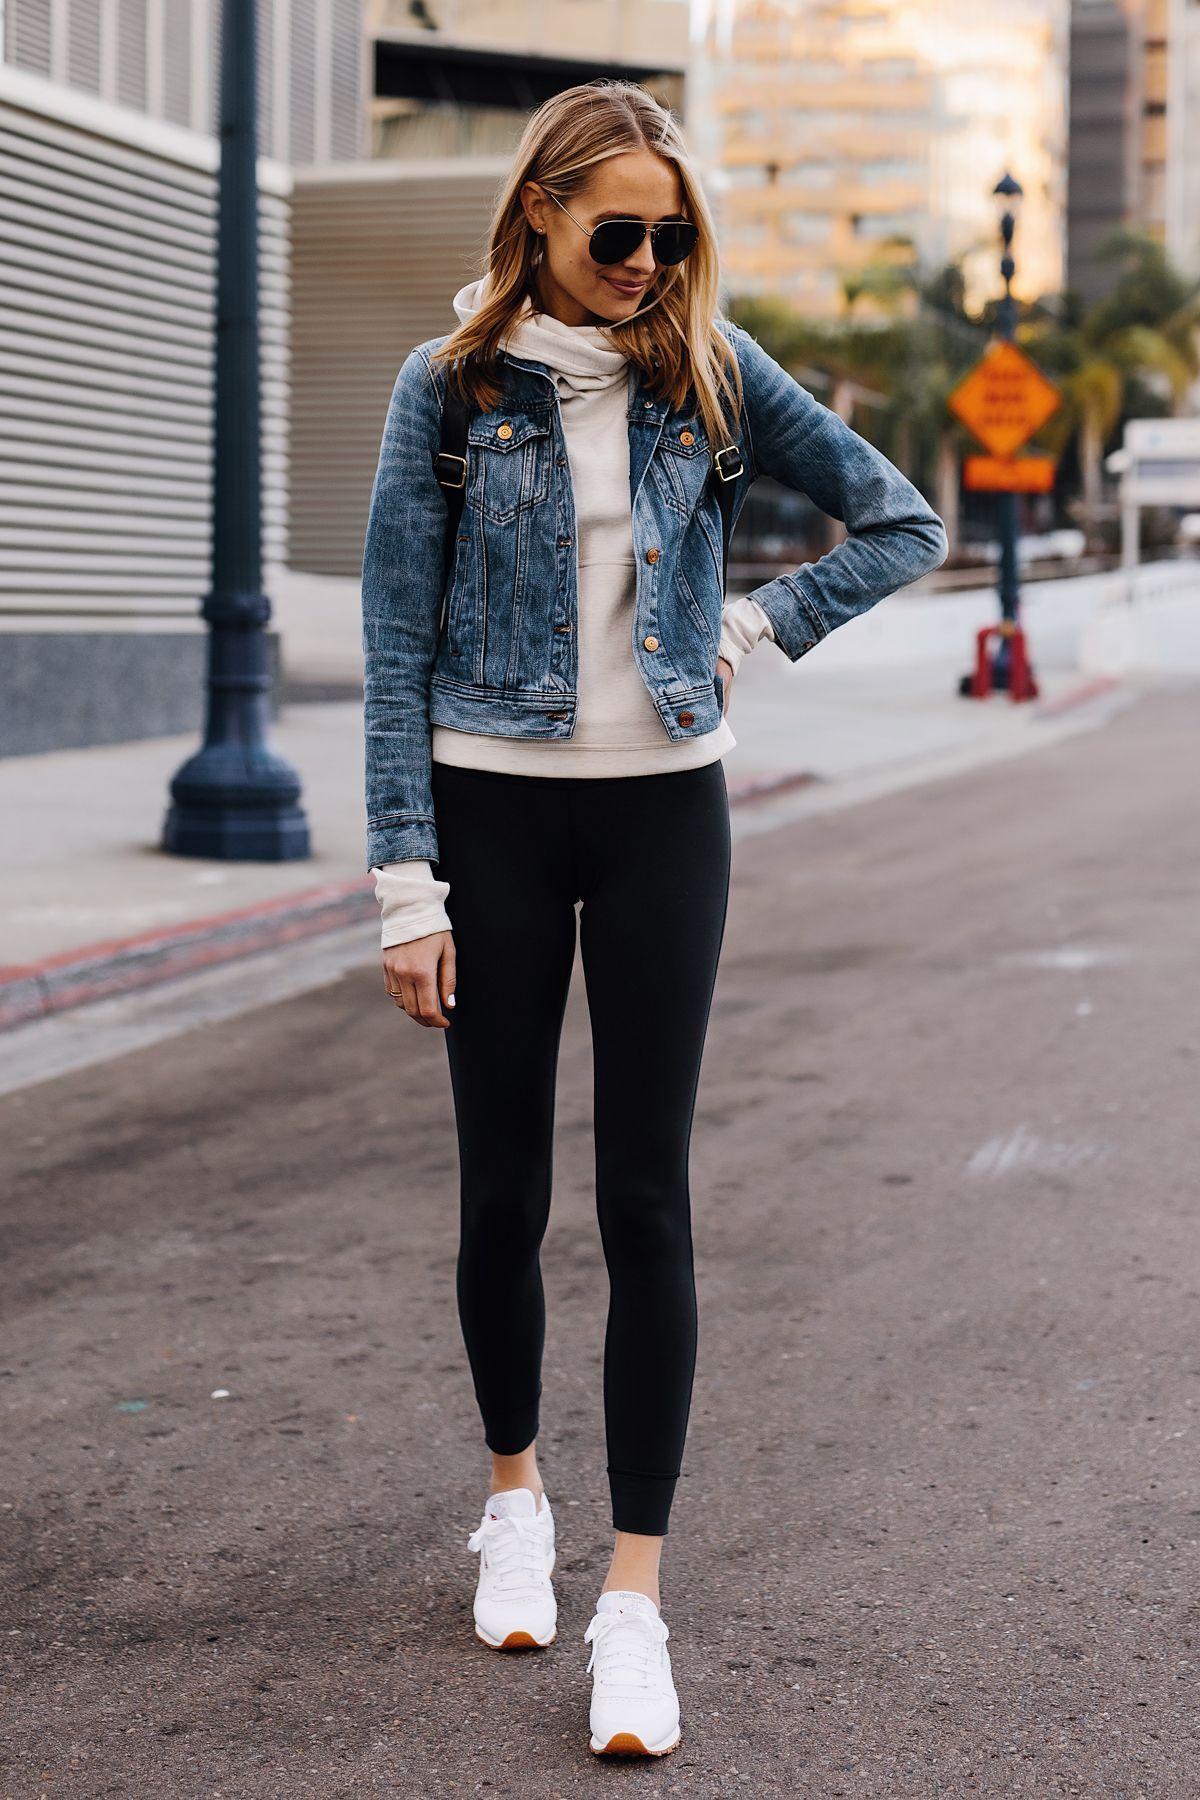 Fashion Jackson Athleisure Outfit Denim Jacket Grey Sweatshirt Black Leggings Reebok Classic Whi Black Leggings Outfit Athleisure Outfits Outfits With Leggings